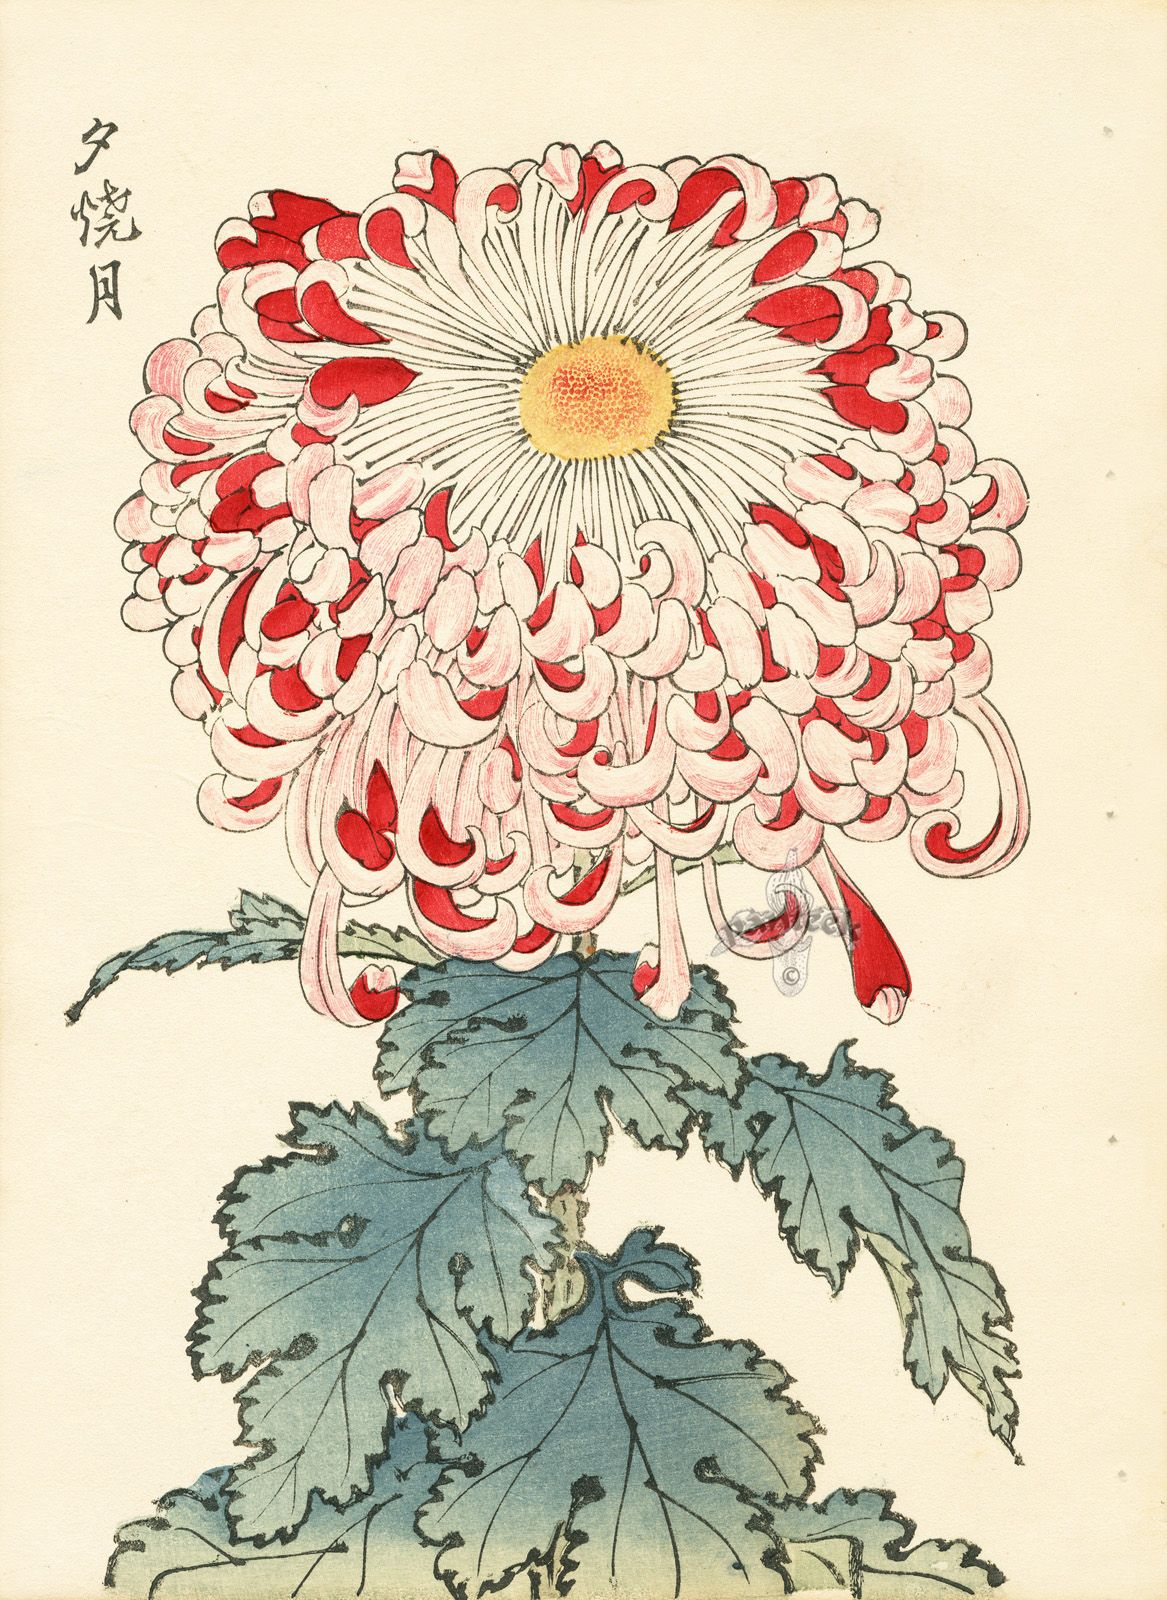 Keika Hasegawa Chrysanthemum Wood Block Prints 1893 Japanese Woodblock Printing Flower Art Botanical Watercolor